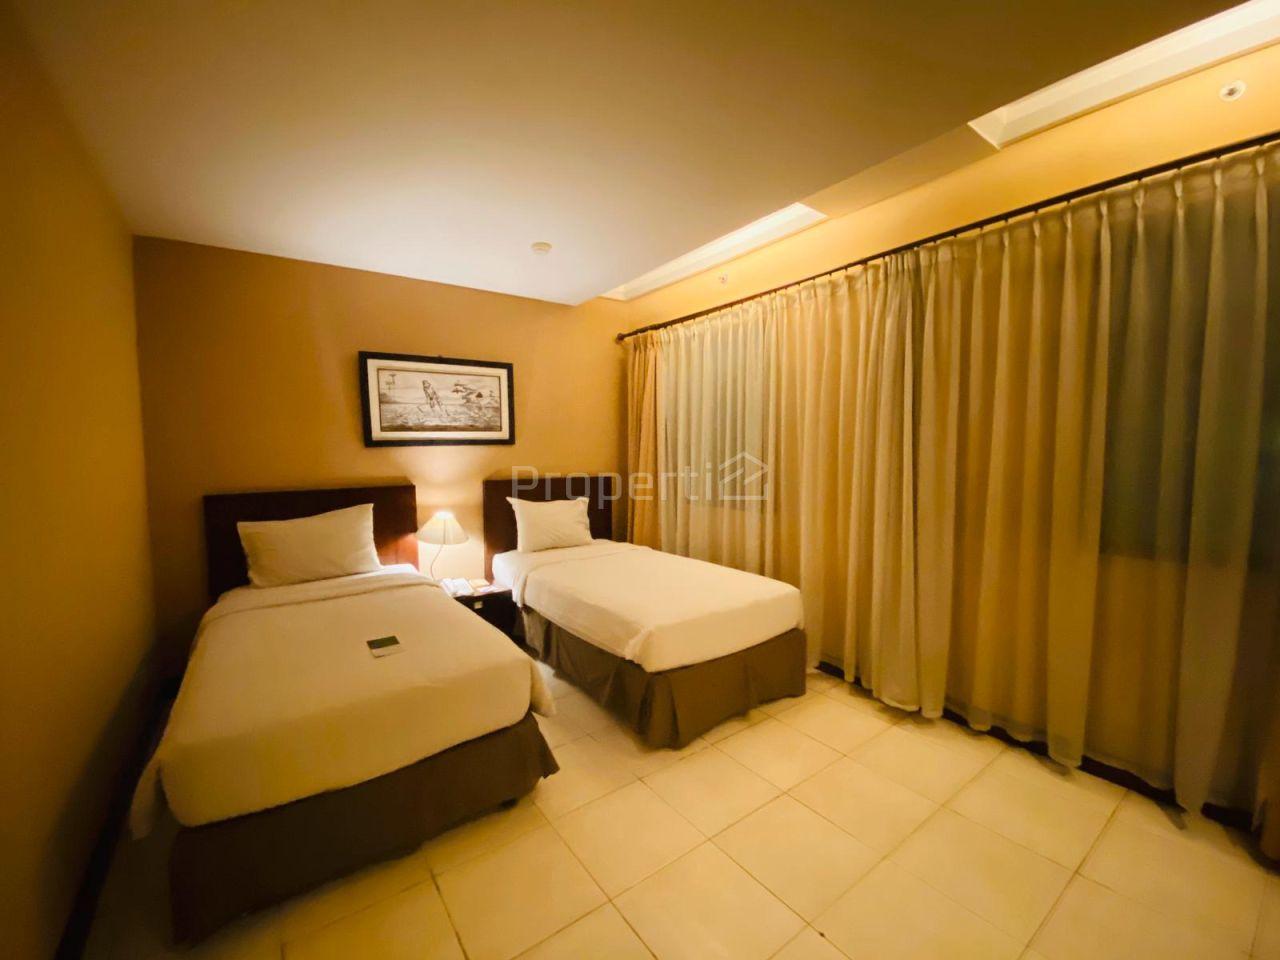 Queen Type 2 Bedroom Unit in Majesty Apartment, 9th Floor, Jawa Barat